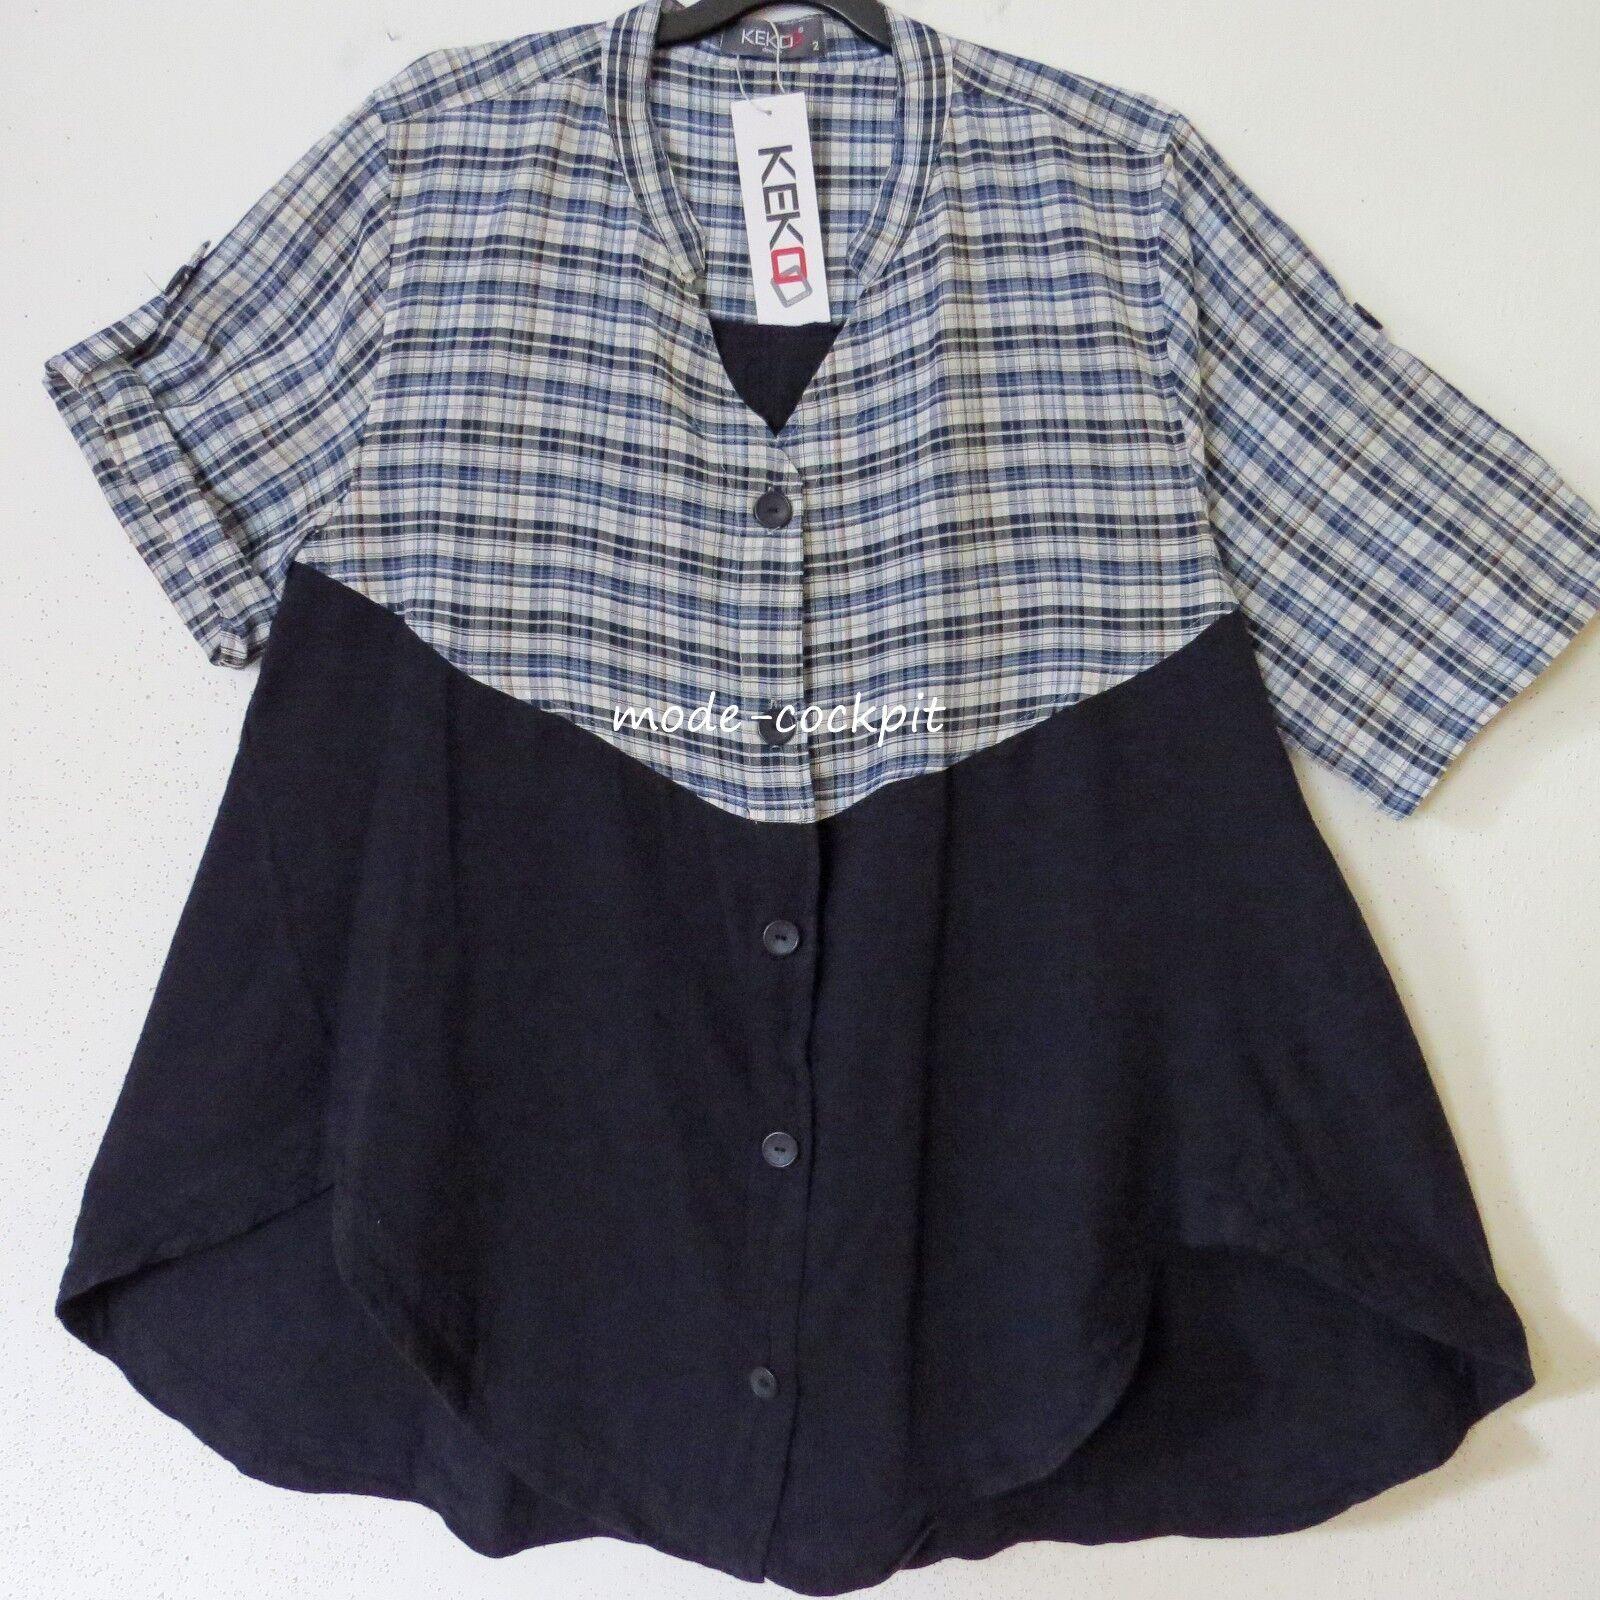 KEKOO lässiges bluesen Shirt Tunika Lagenlook Leinenmix marine + Karo 52-54 (3)